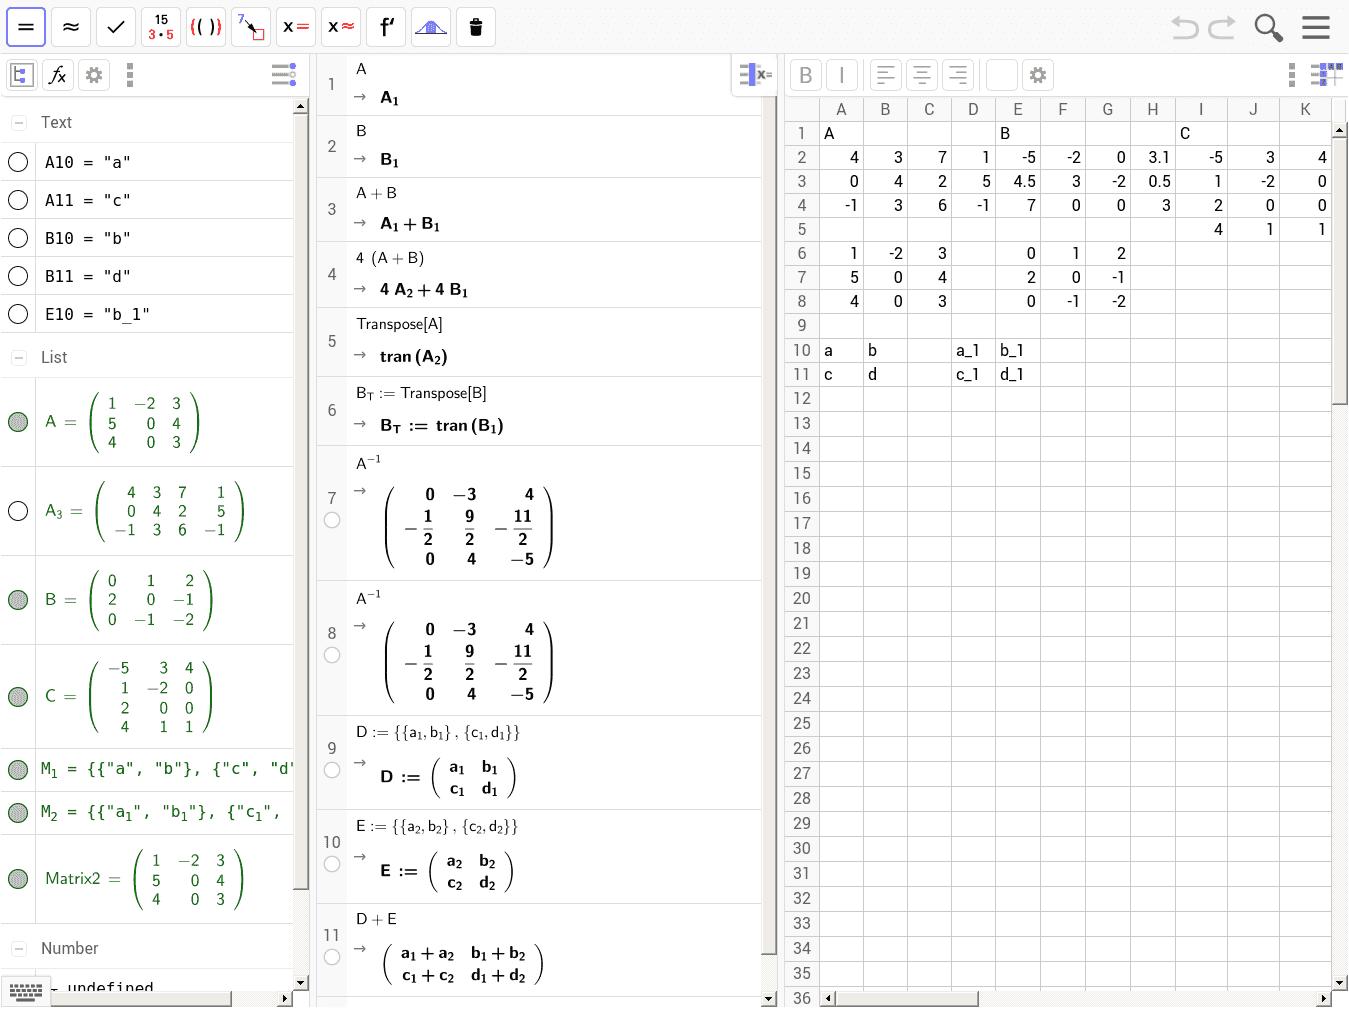 FoBi: GeoGebra-II: Matrizen im BG - GeoGebraBook